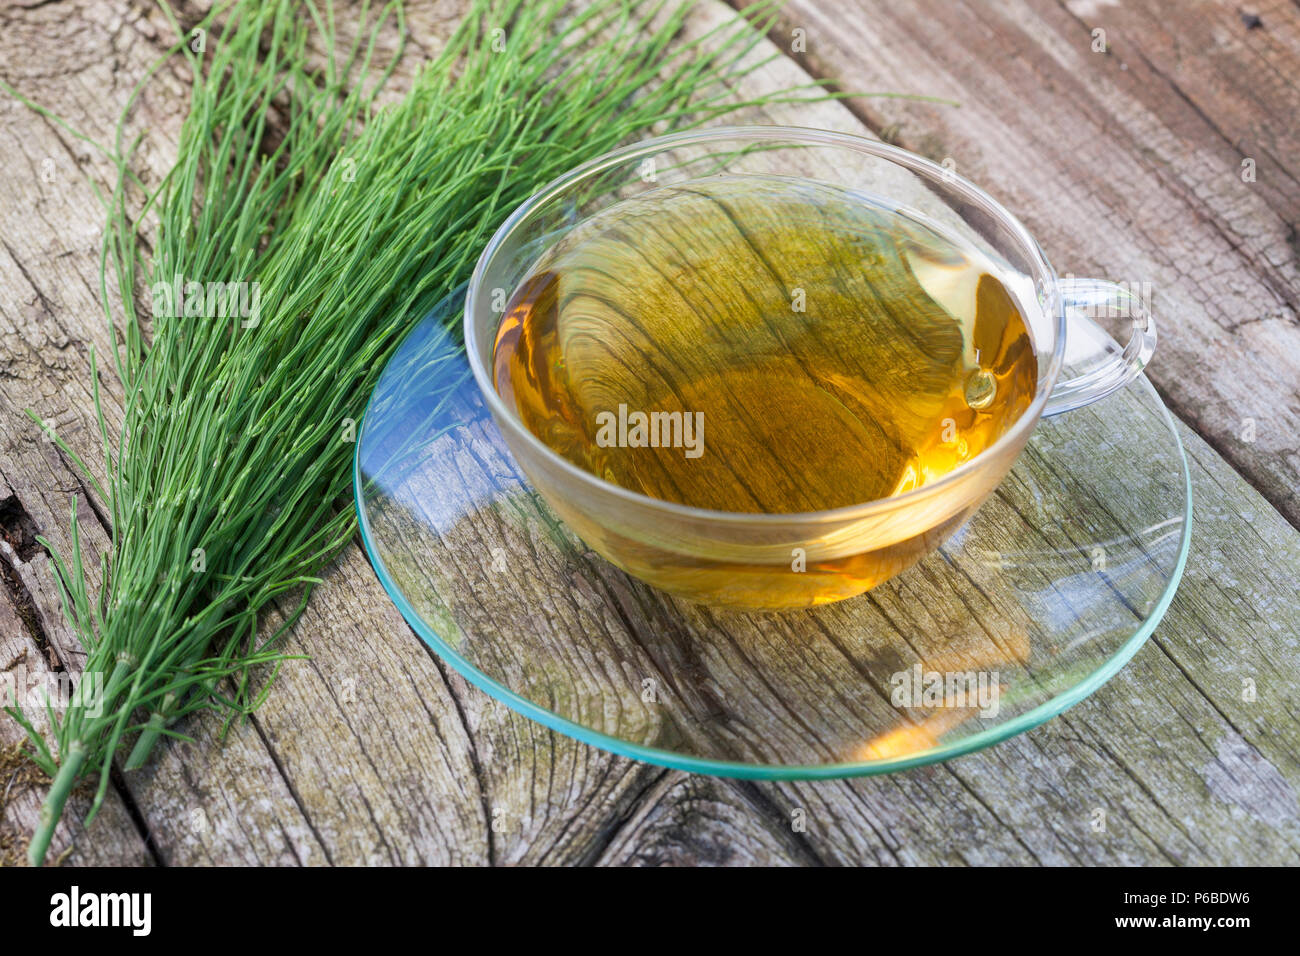 Acker-Schachtelhalm-Tee, Schachtelhalm-Tee, Schachtelhalmtee, Tee aus Ackerschachtelhalm, Heiltee, Kräutertee, Ackerschachtelhalm, Schachtelhalm, Zinn - Stock Image